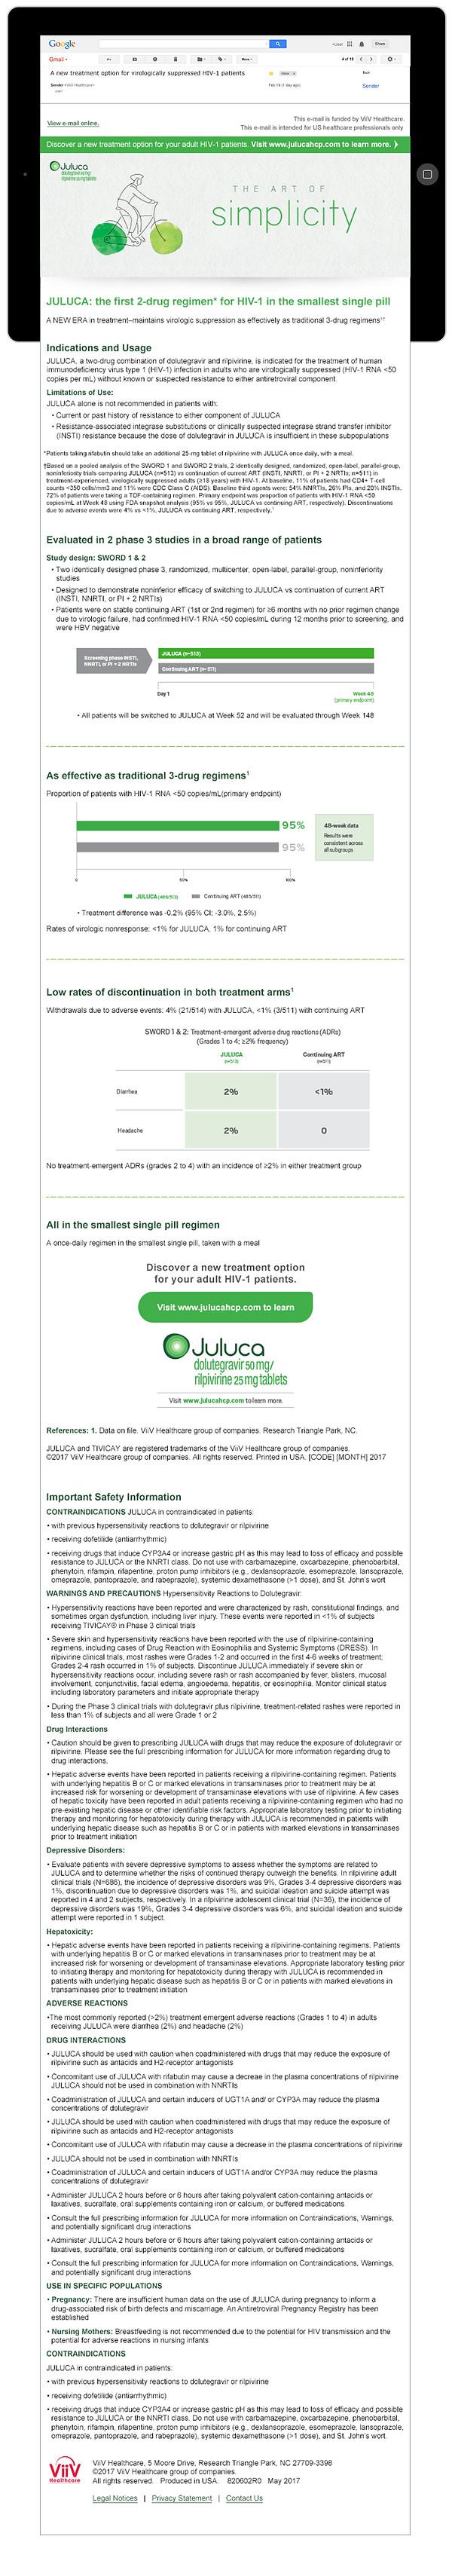 Juluca_01_mockup_email.jpg